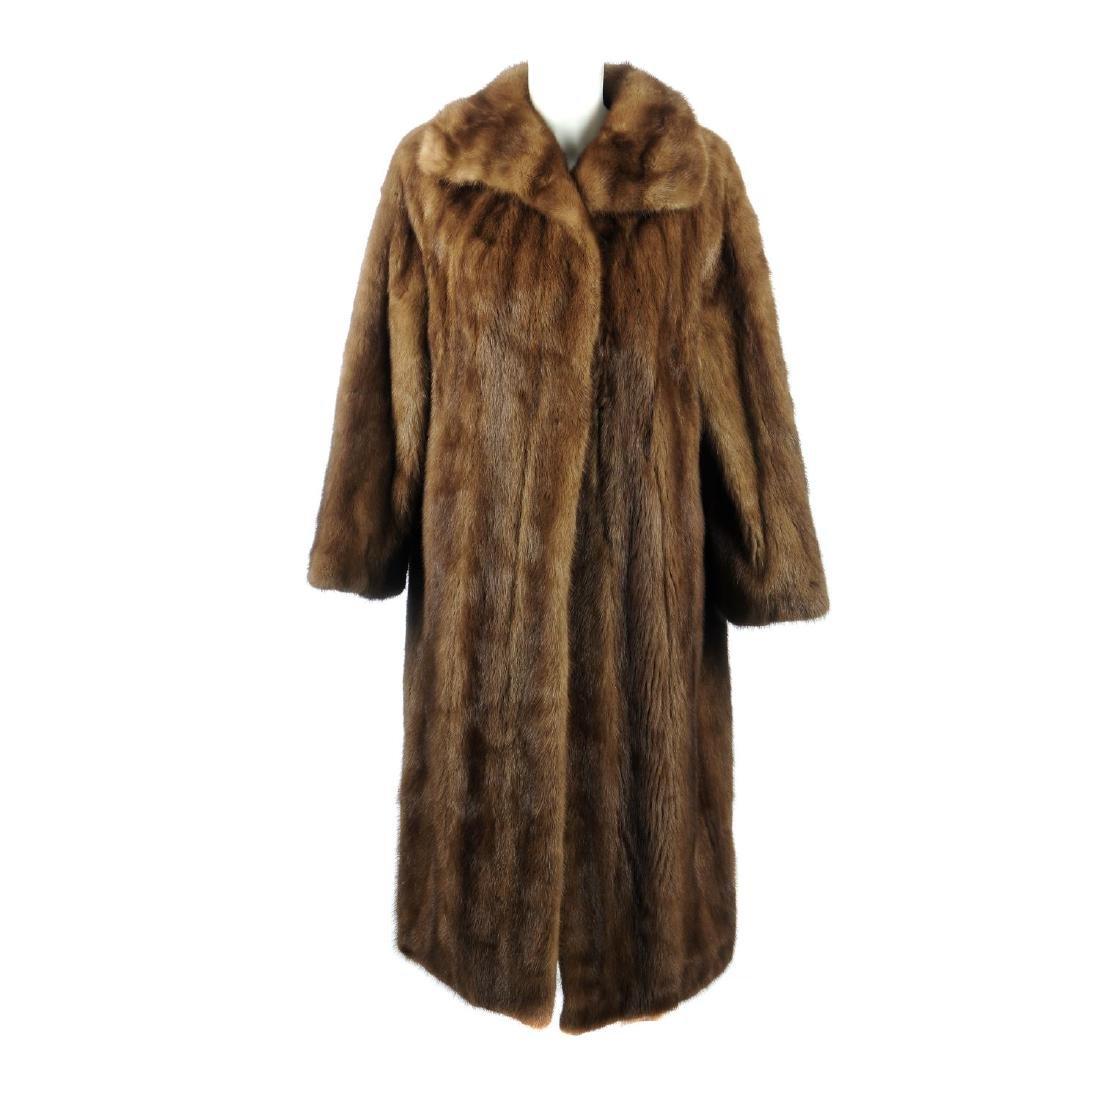 A full-length demi-buff mink coat. Designed with a